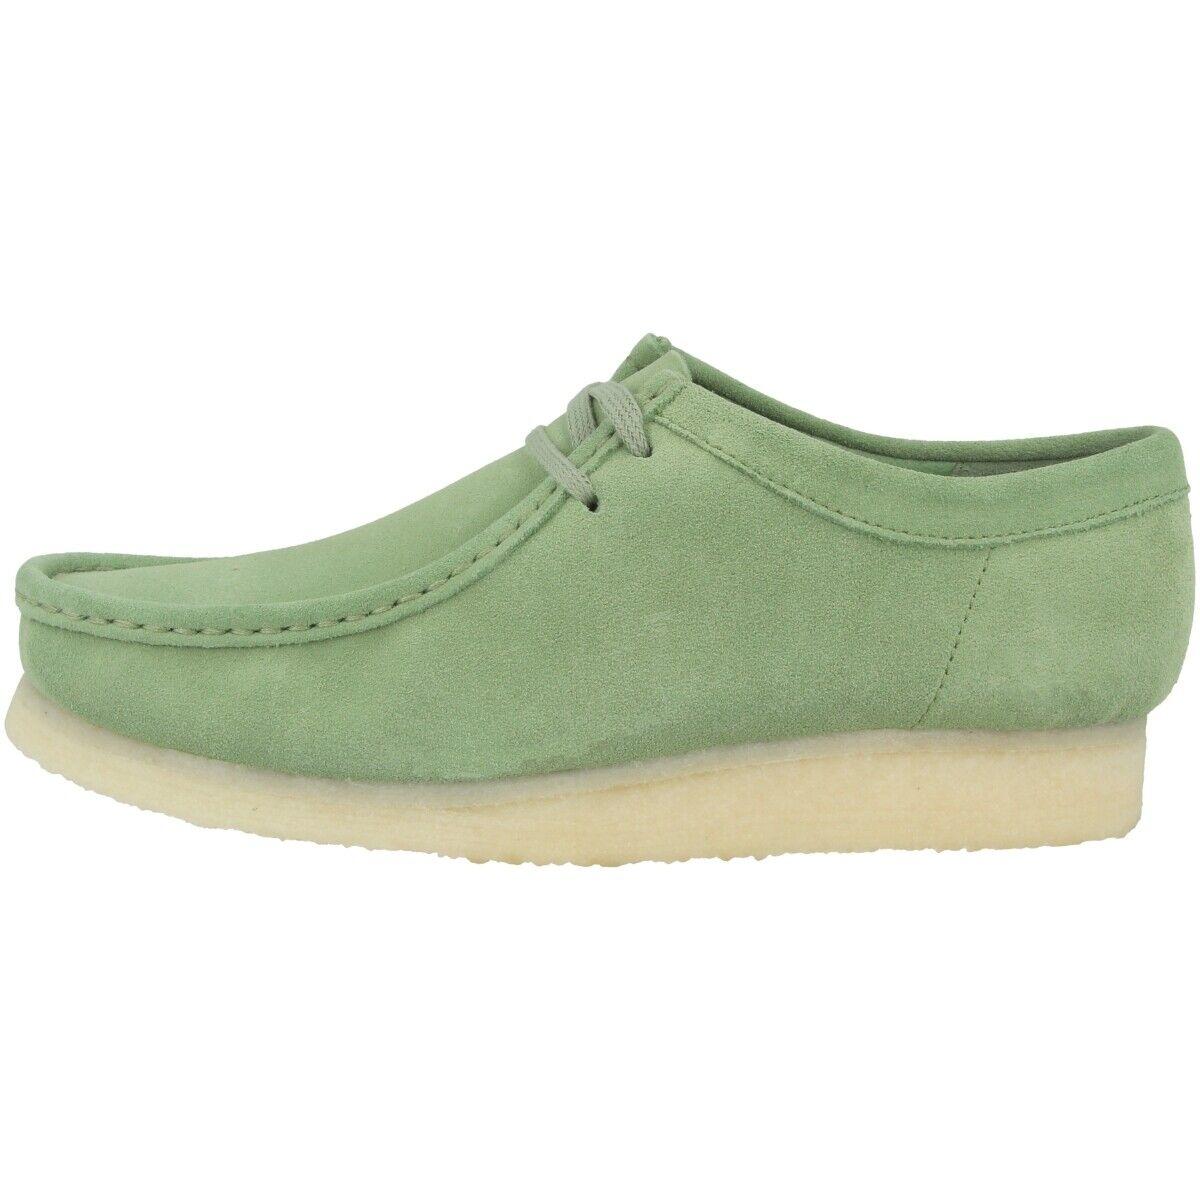 Clarks Wallabee shoes men shoes di Cuoio Stringate Mocassini 26139177